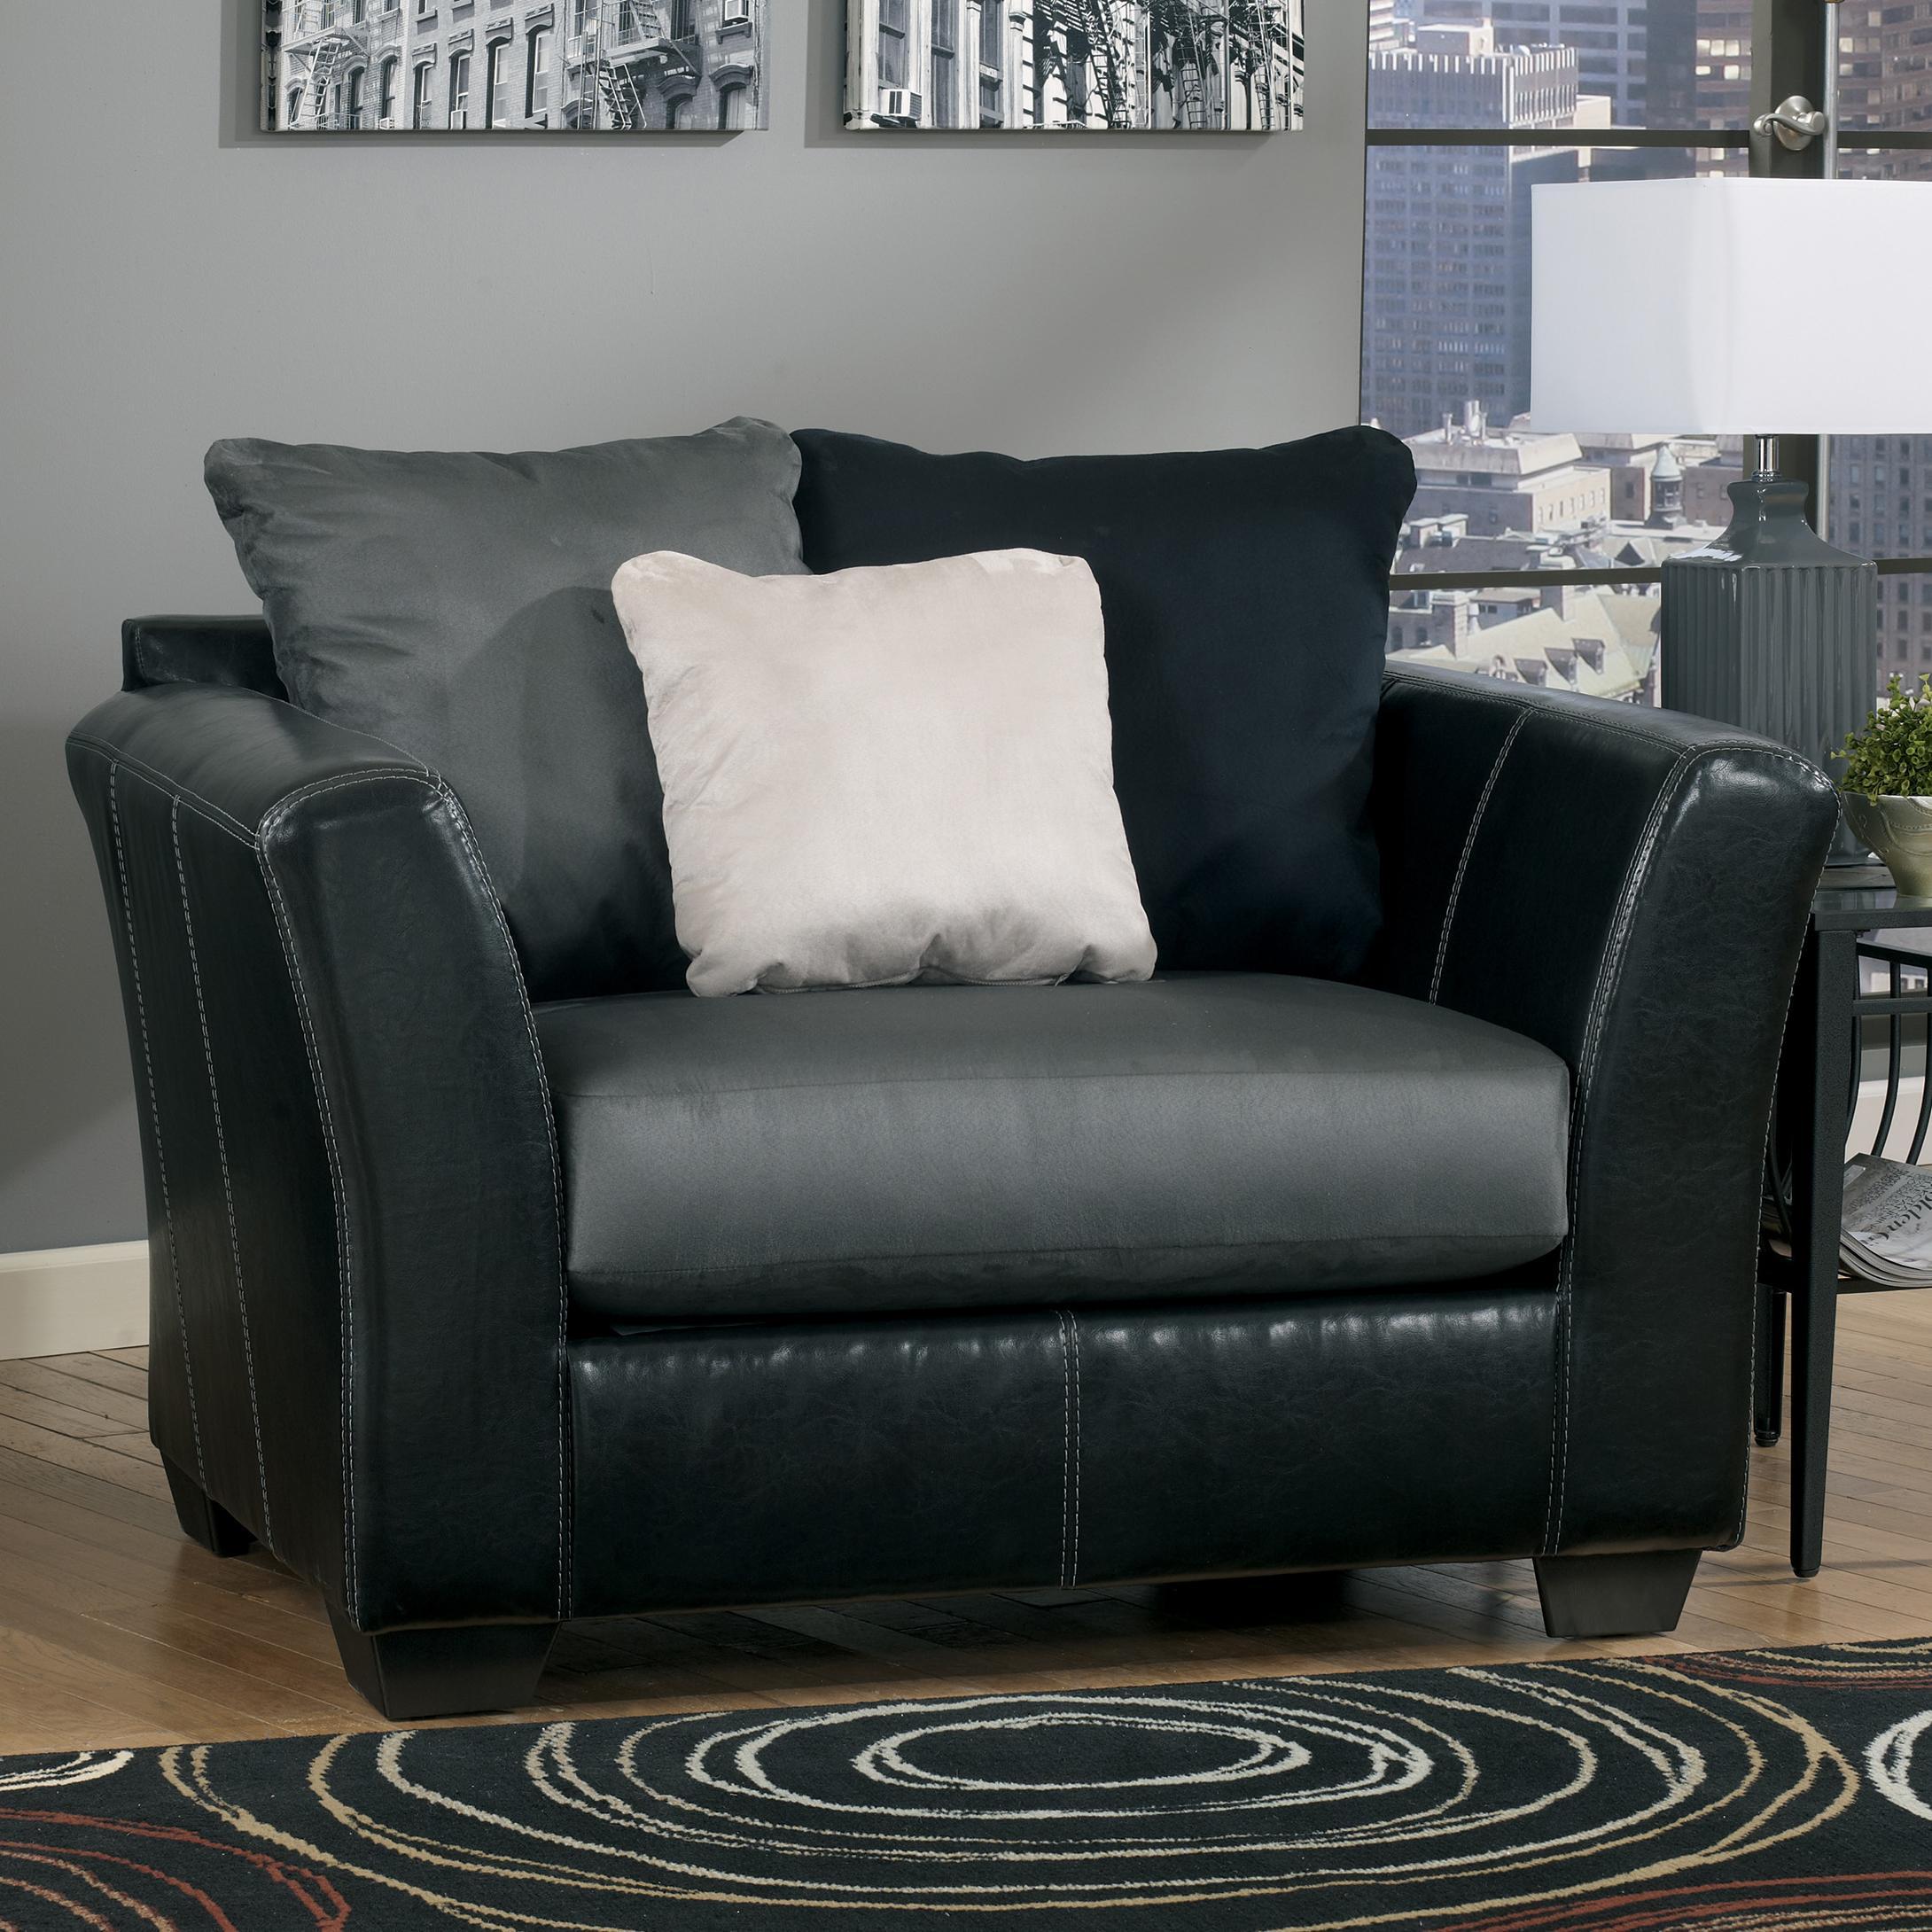 Ashley/Benchcraft Masoli - Cobblestone Chair and a Half - Item Number: 1420023